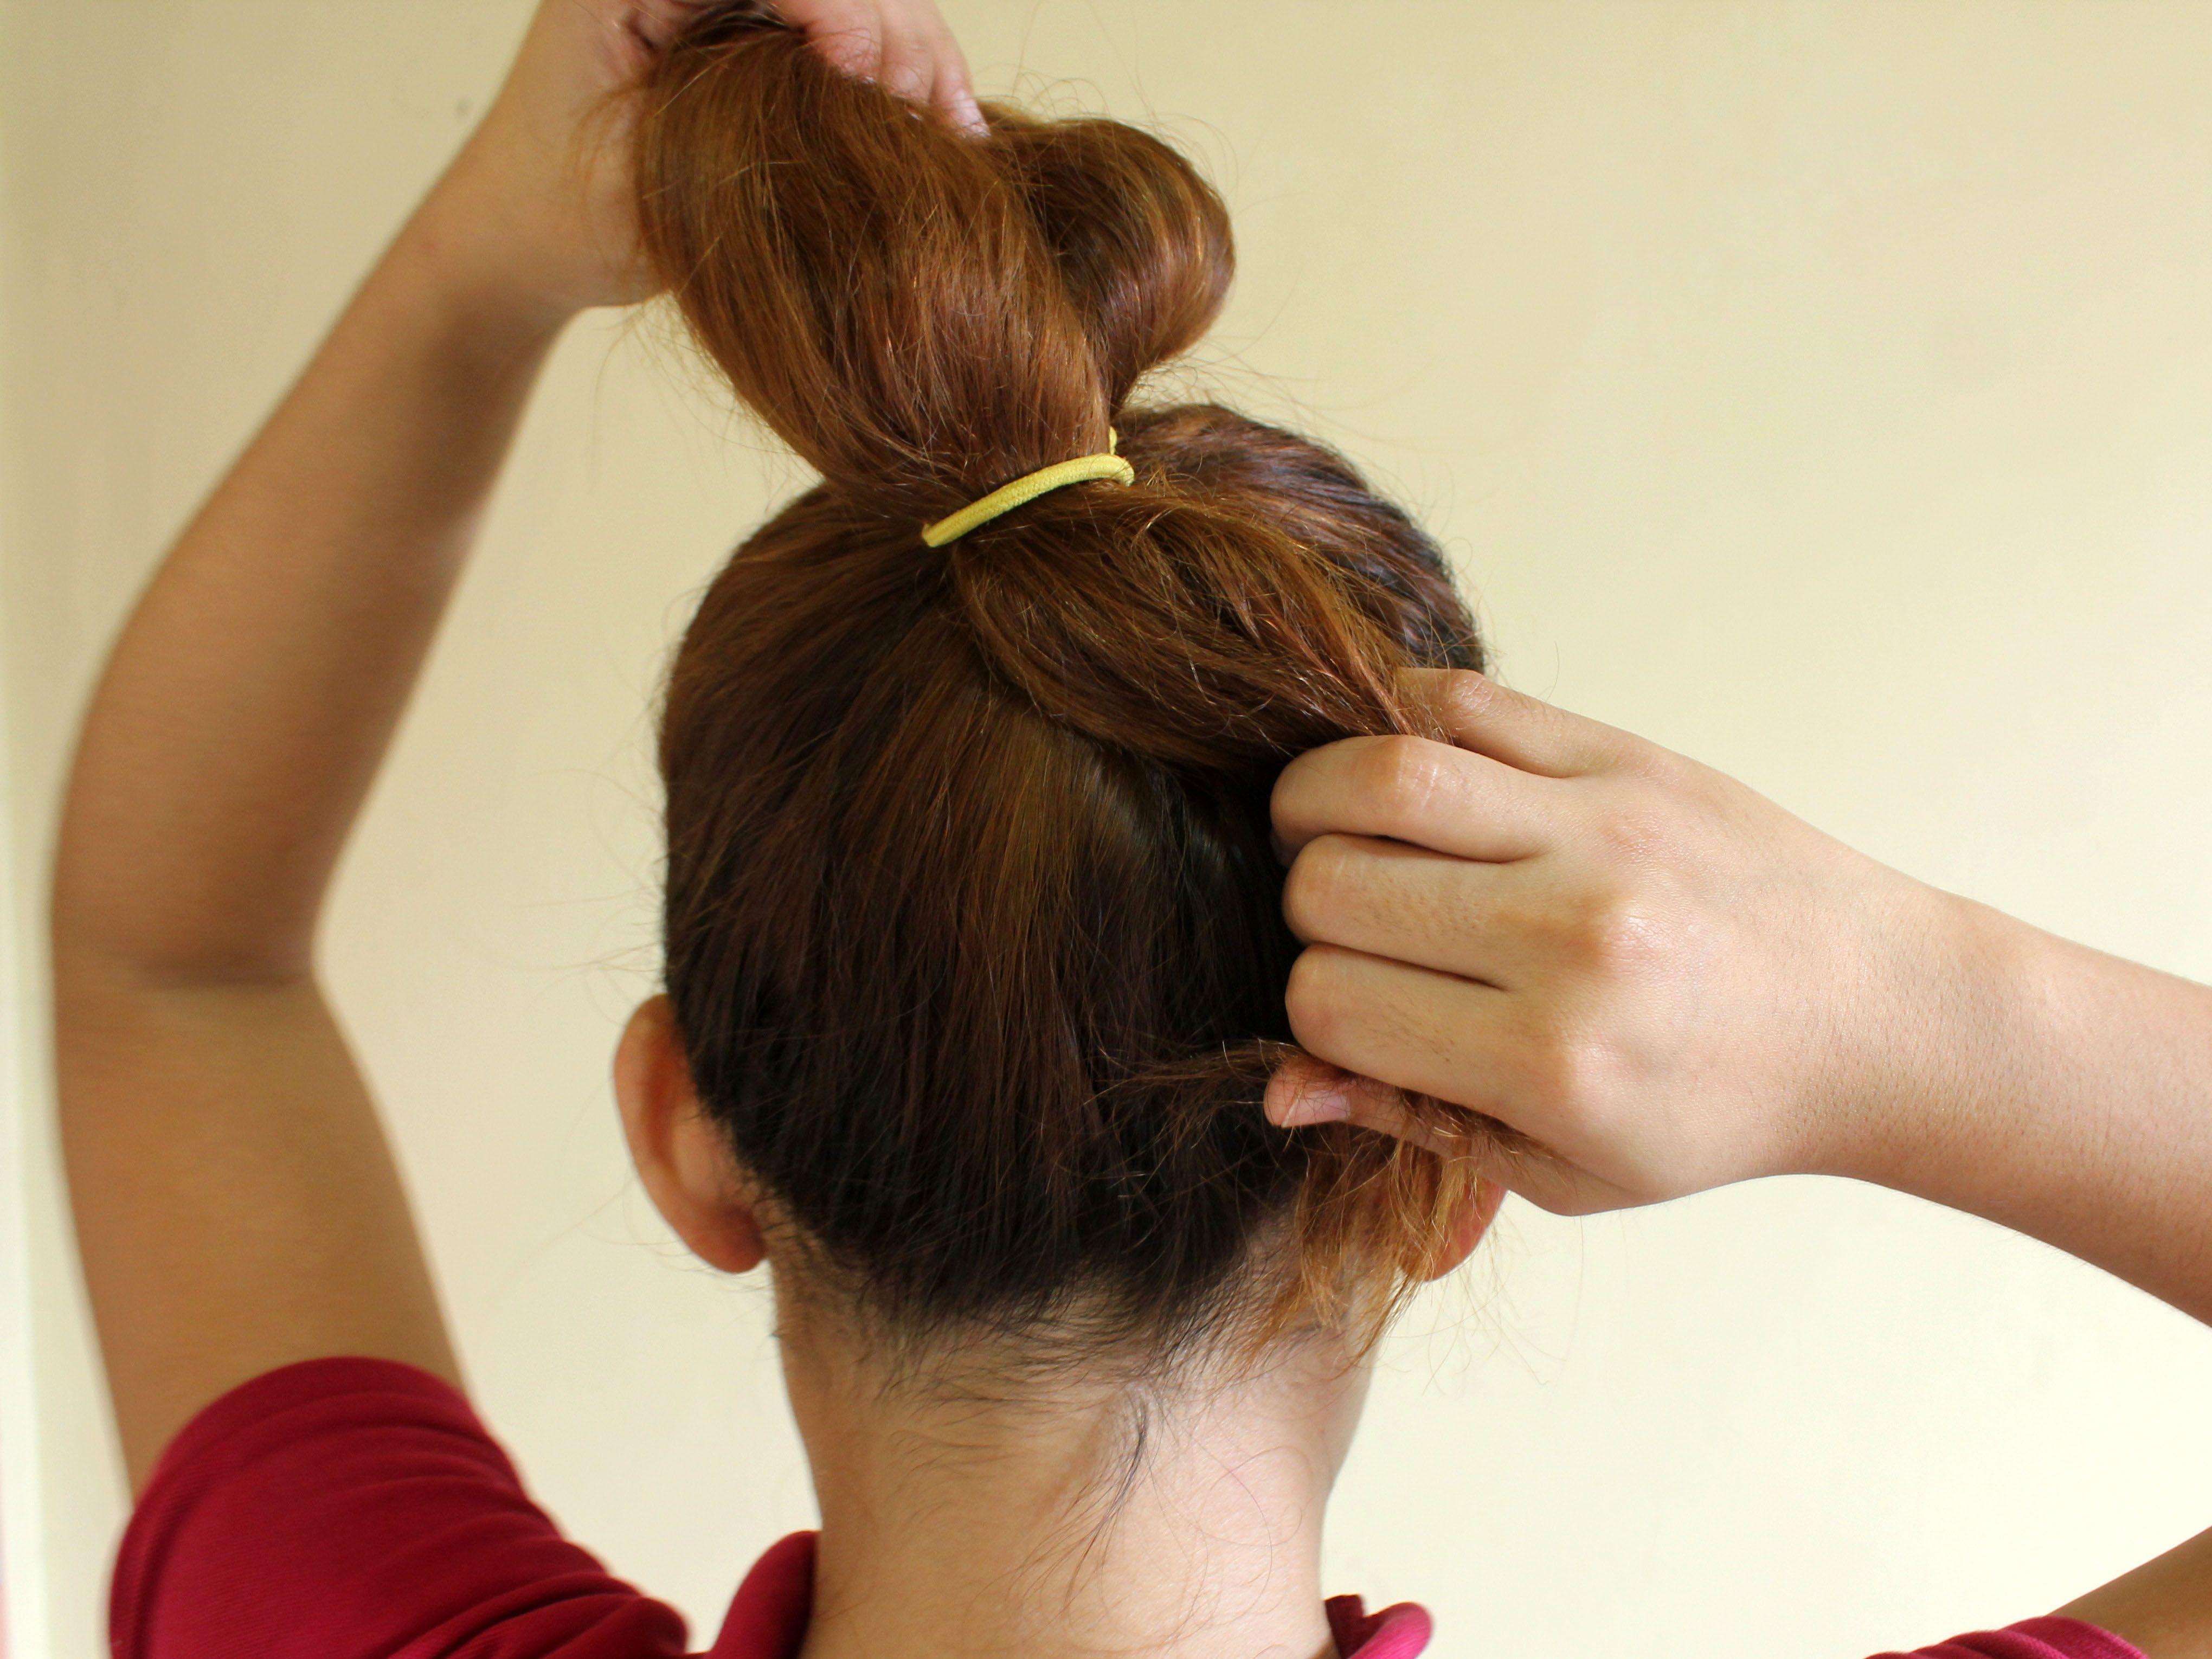 How To Make A Messy Bun Gifs Messy Bun Hairstyles Hair Hacks Bun Hairstyles